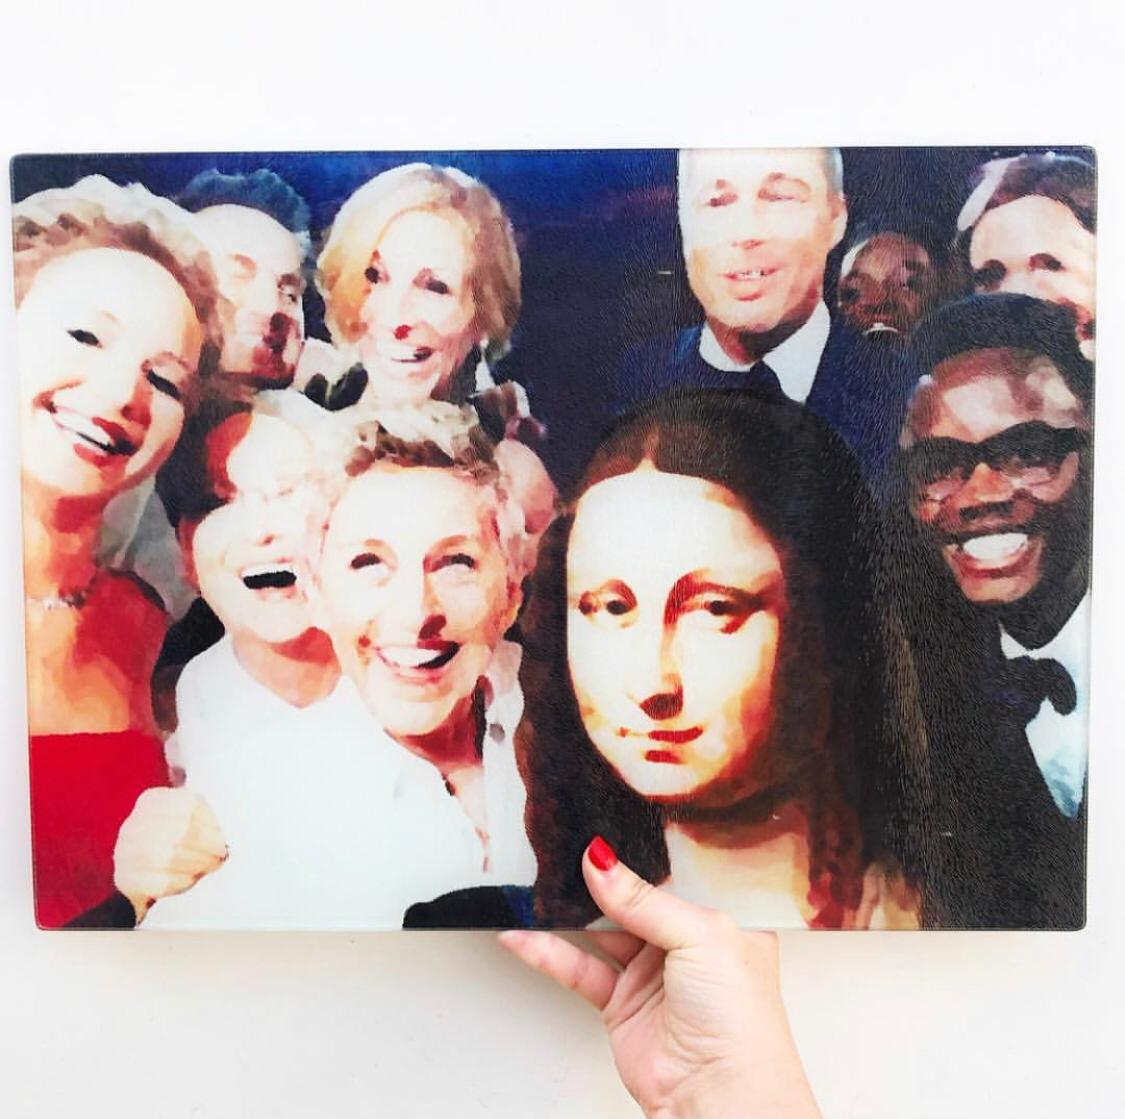 Personalised glass chopping board on Artwow: Art Of Selfies by designer Wallace Elizabeth